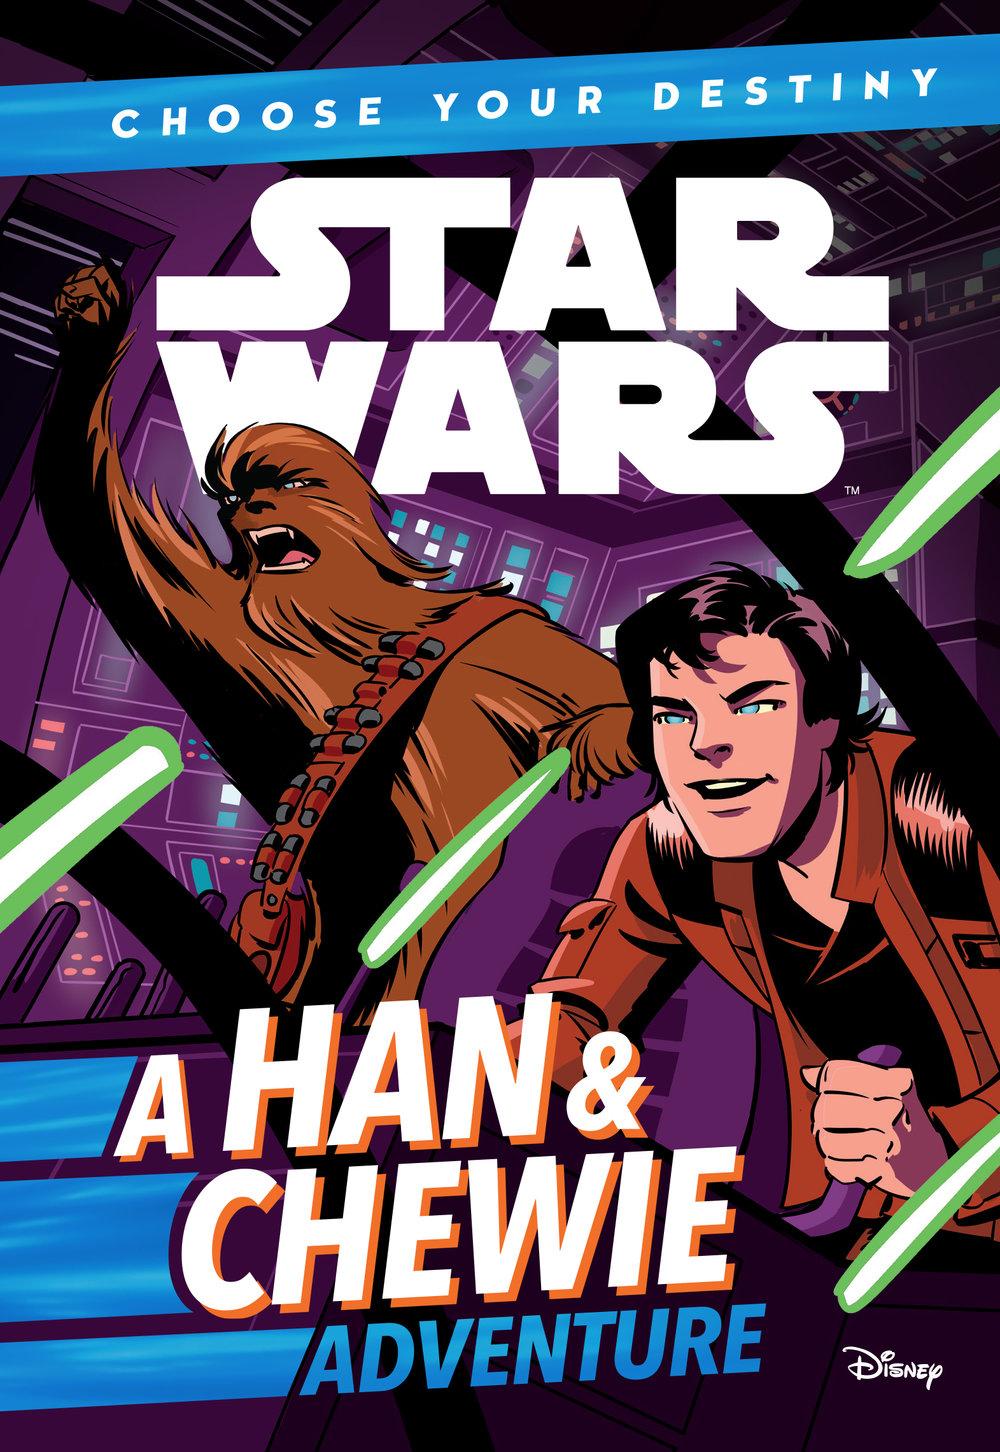 Star Wars_ChooseYourDestiny_Han_CVR_fnlRGB.jpg